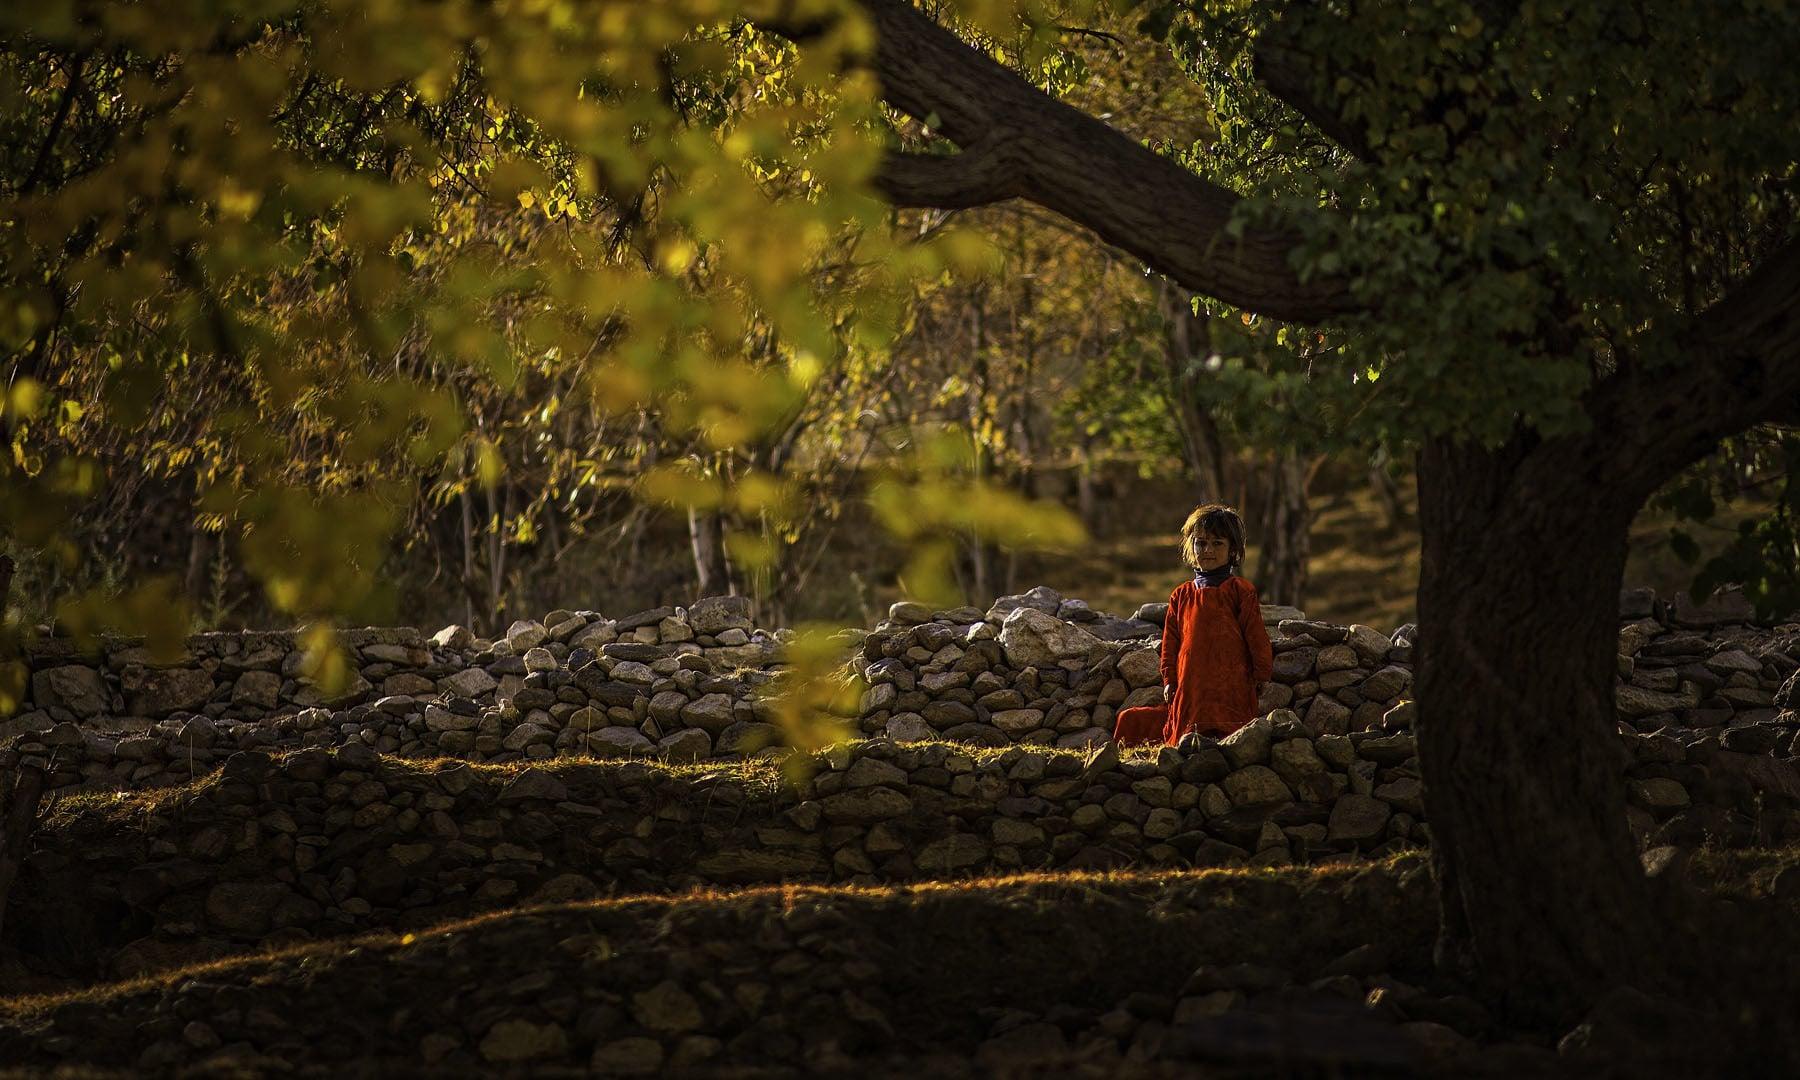 Under the tree.